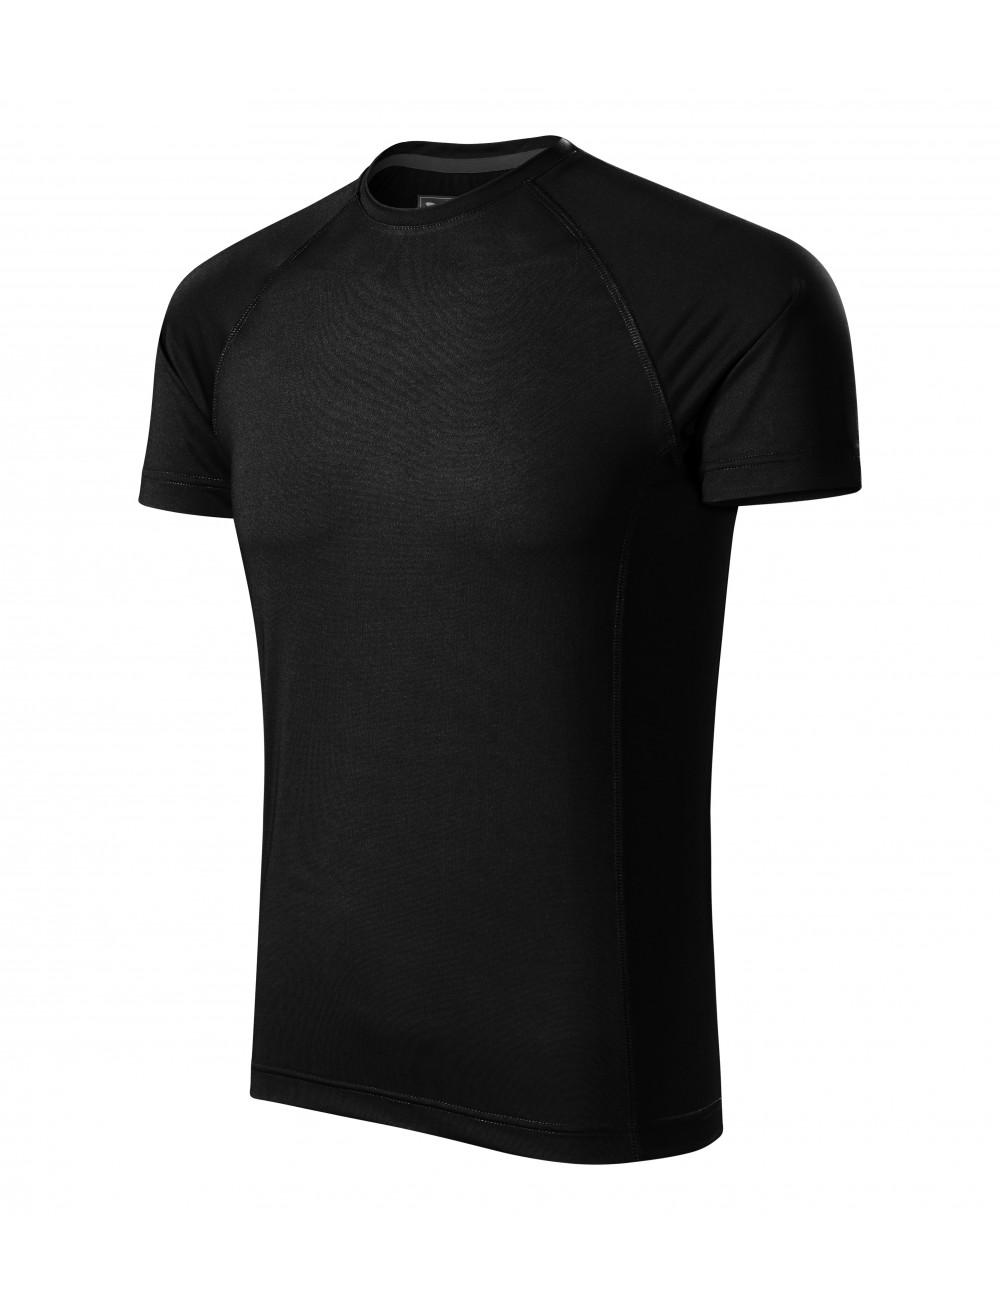 Adler MALFINI Koszulka męska Destiny 175 czarny